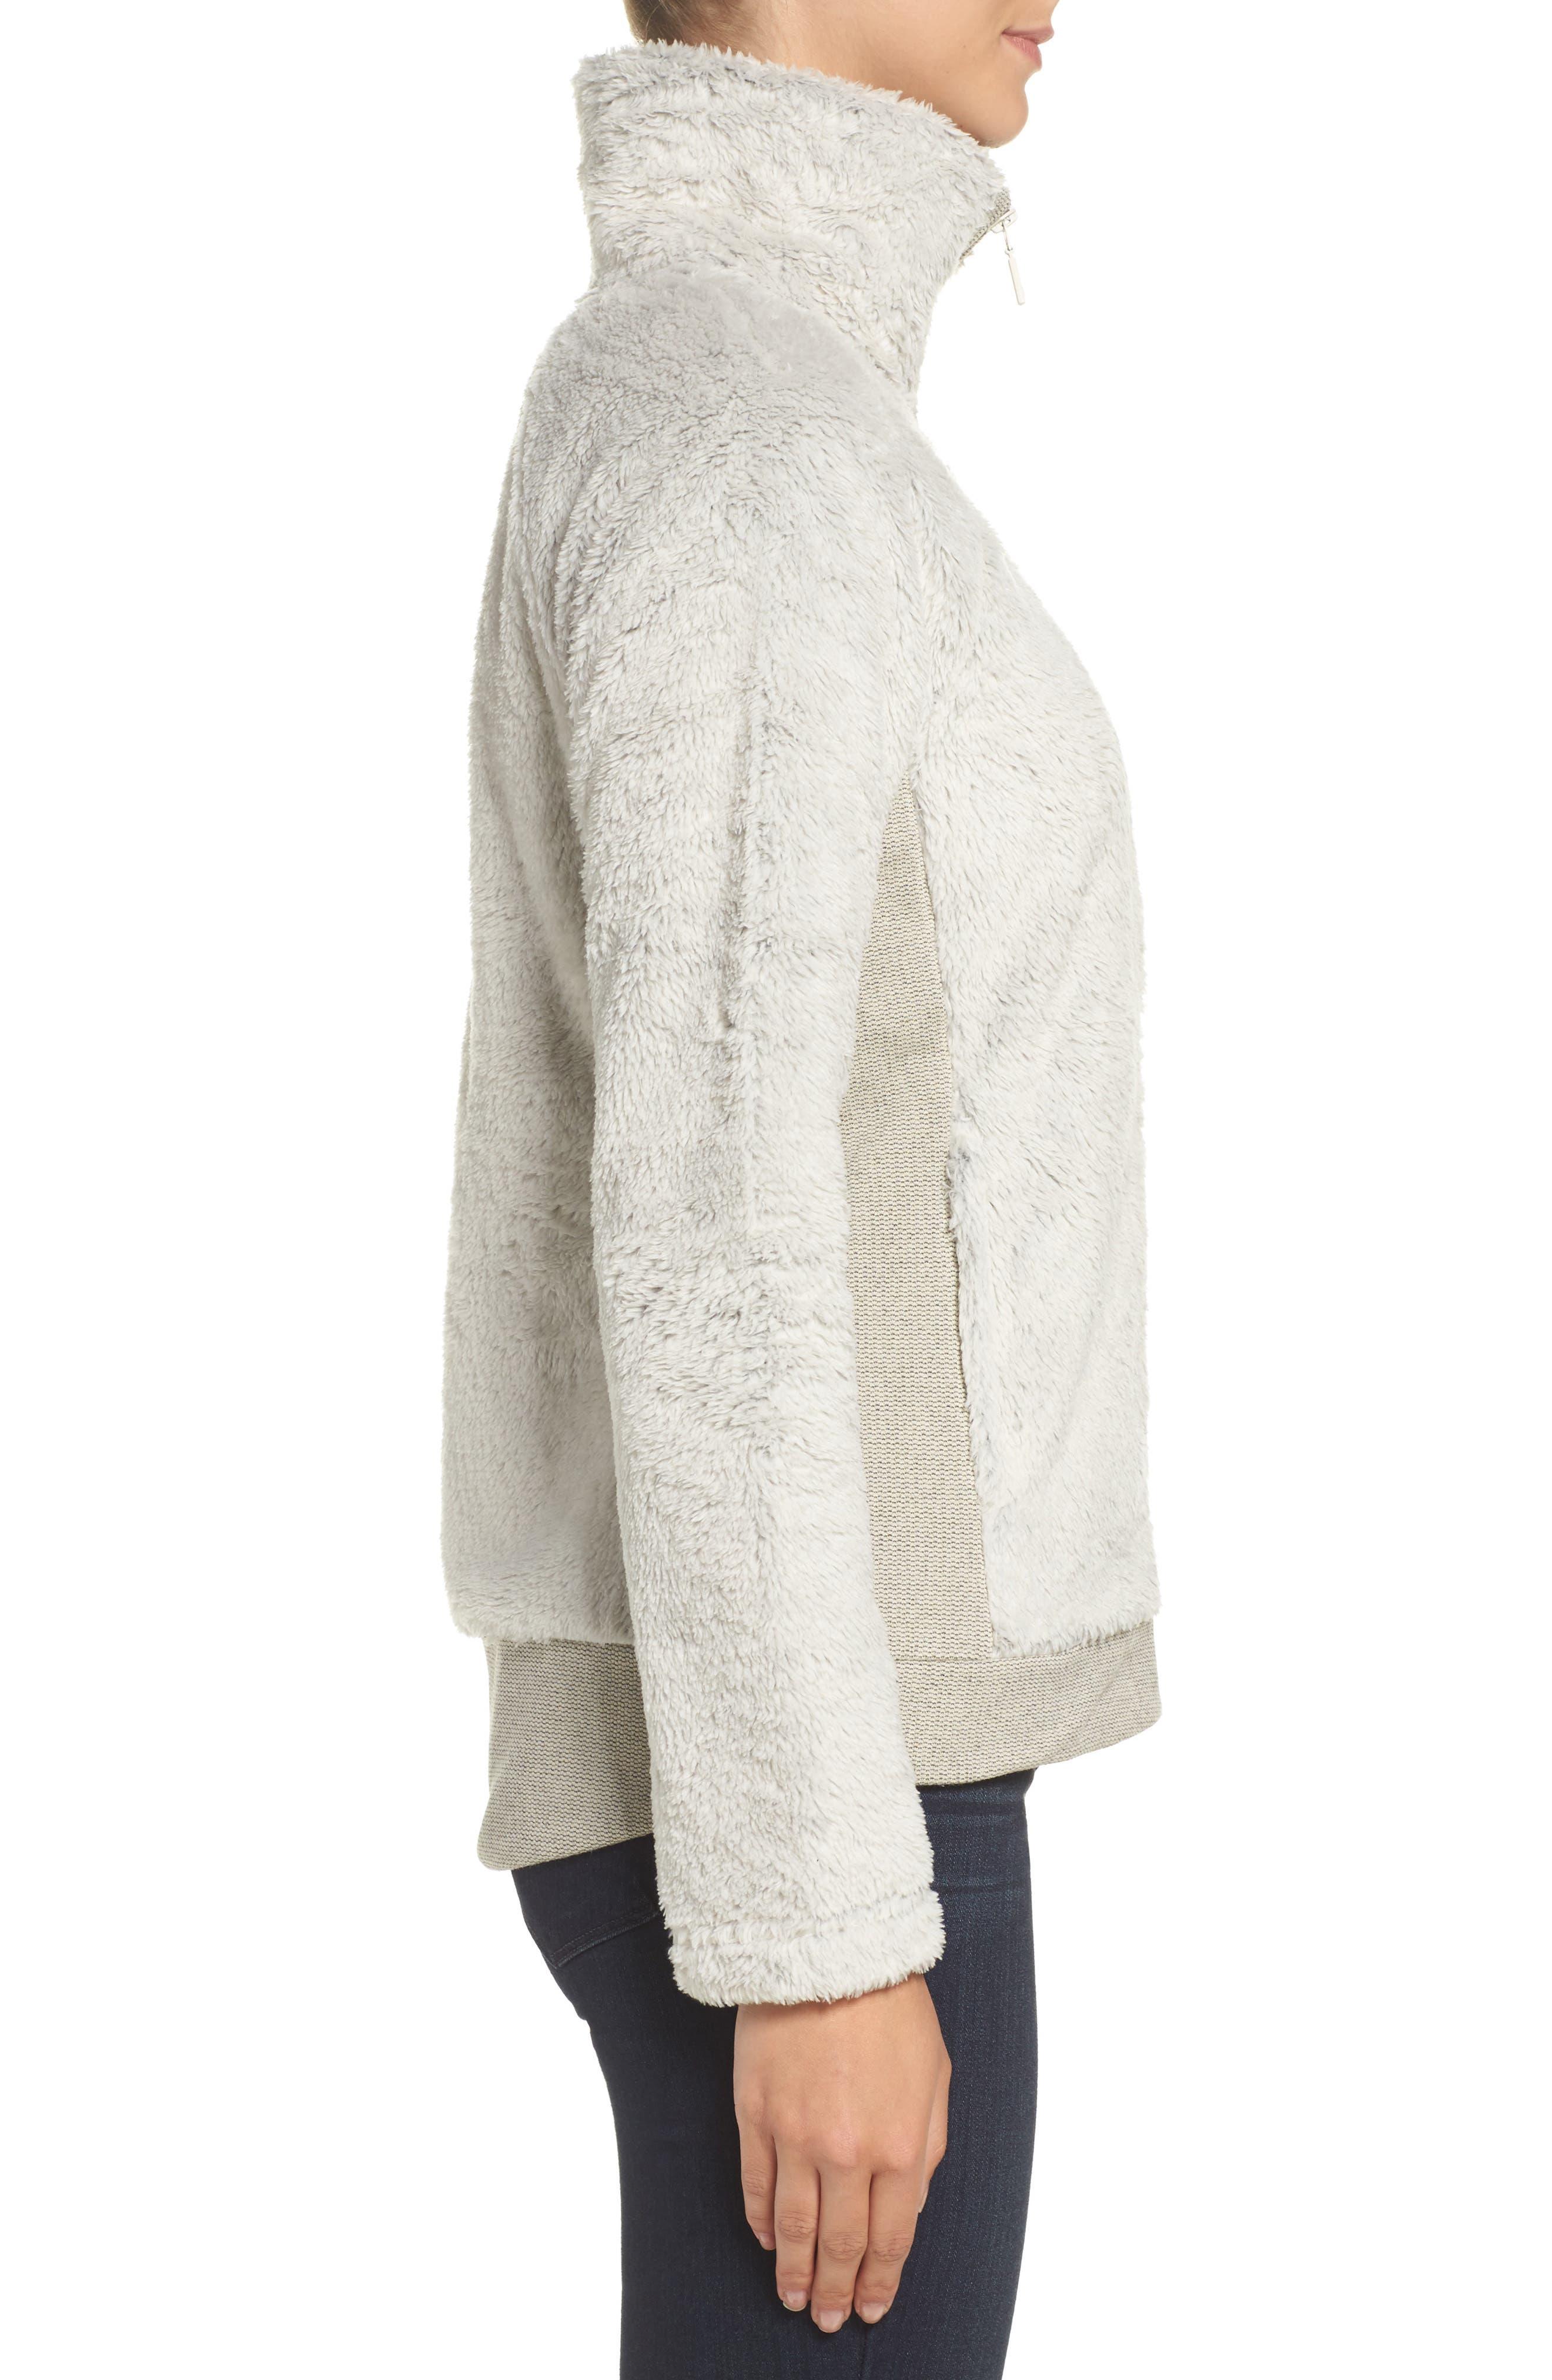 Furry Fleece Jacket,                             Alternate thumbnail 22, color,